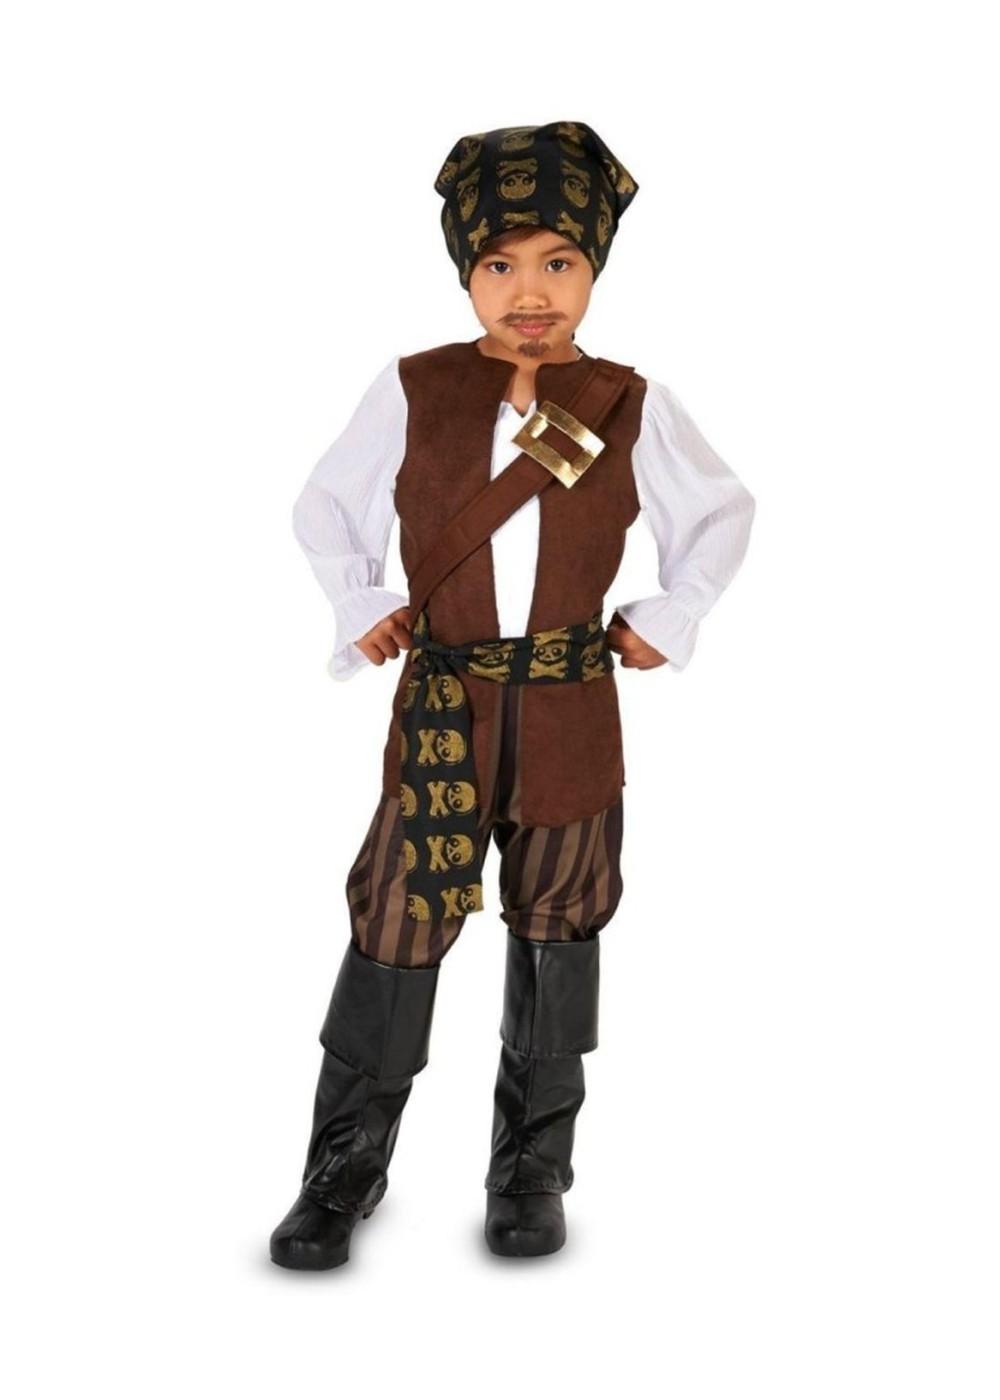 Baby Boys Pirate Costume - Pirate Costumes